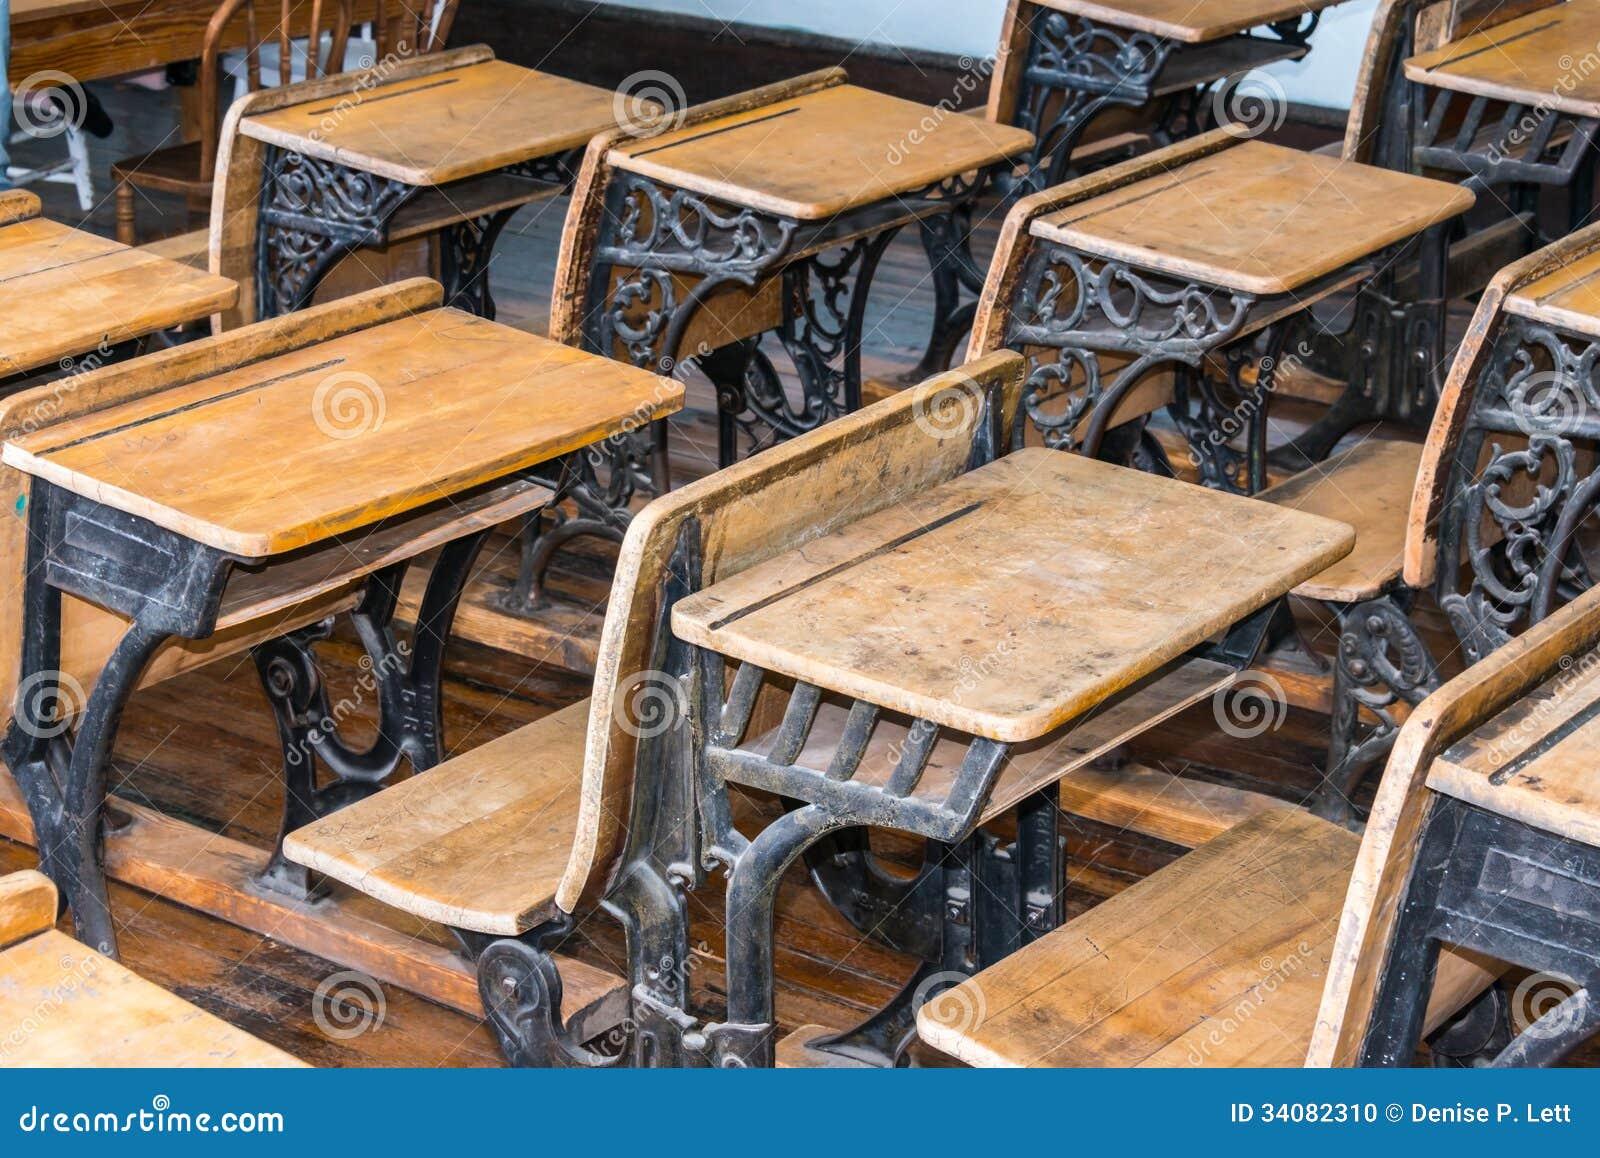 old student classroom desks close up rows antique focus desk